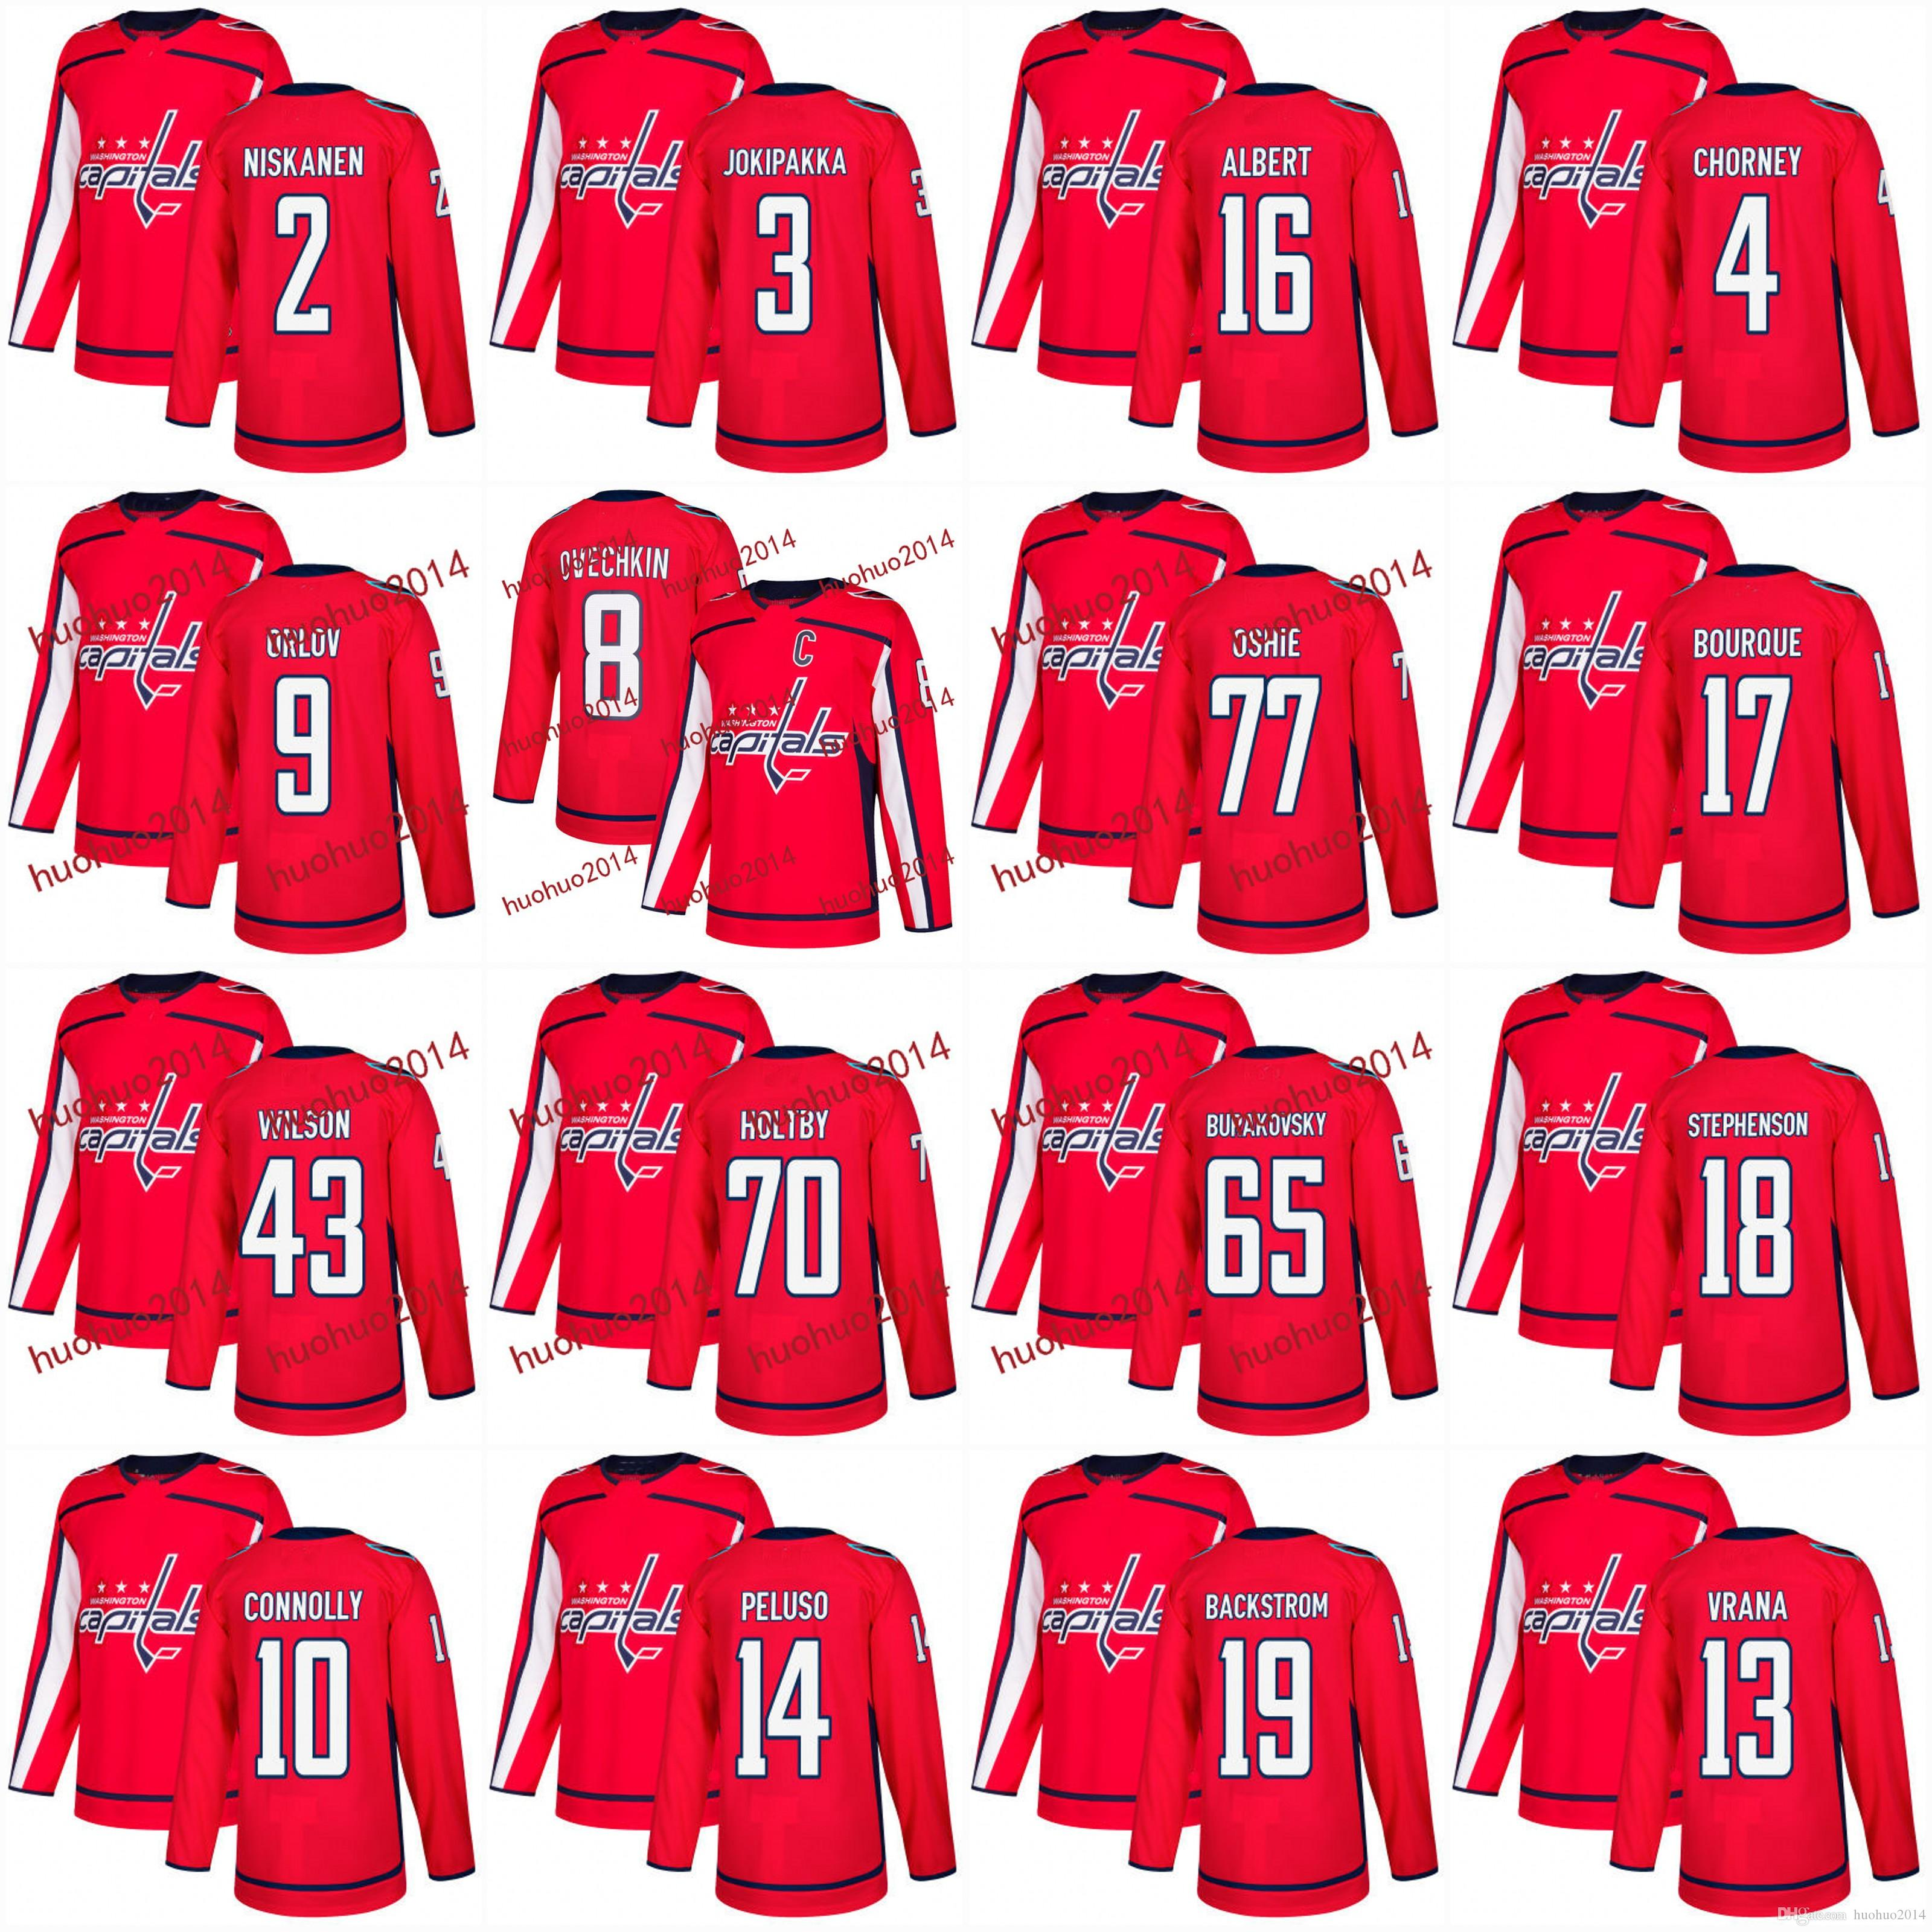 c9bef328537 ... greece 2017 mens washington capitals jerseys 2017 2018 season 8 alex  ovechkin 77 tj fb1e4 28ac2